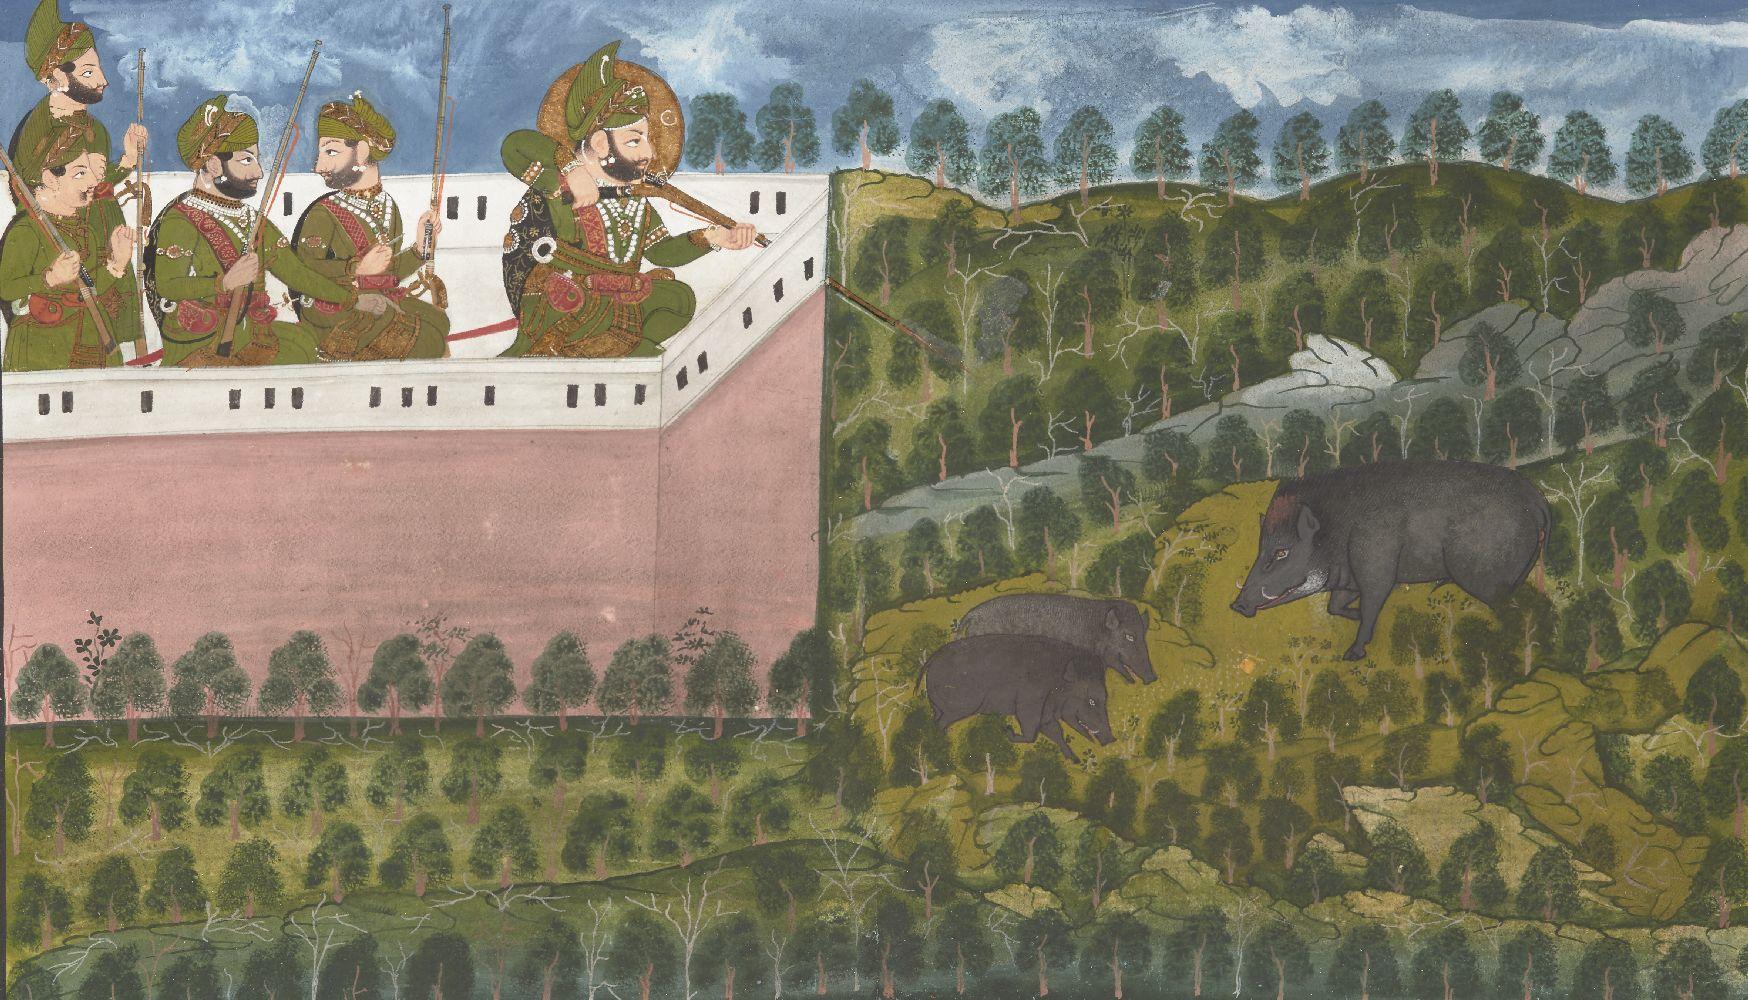 Maharaja Jawan Singh and Sardar Singh hunting wild boar with attendants, Mewar, Rajasthan, North